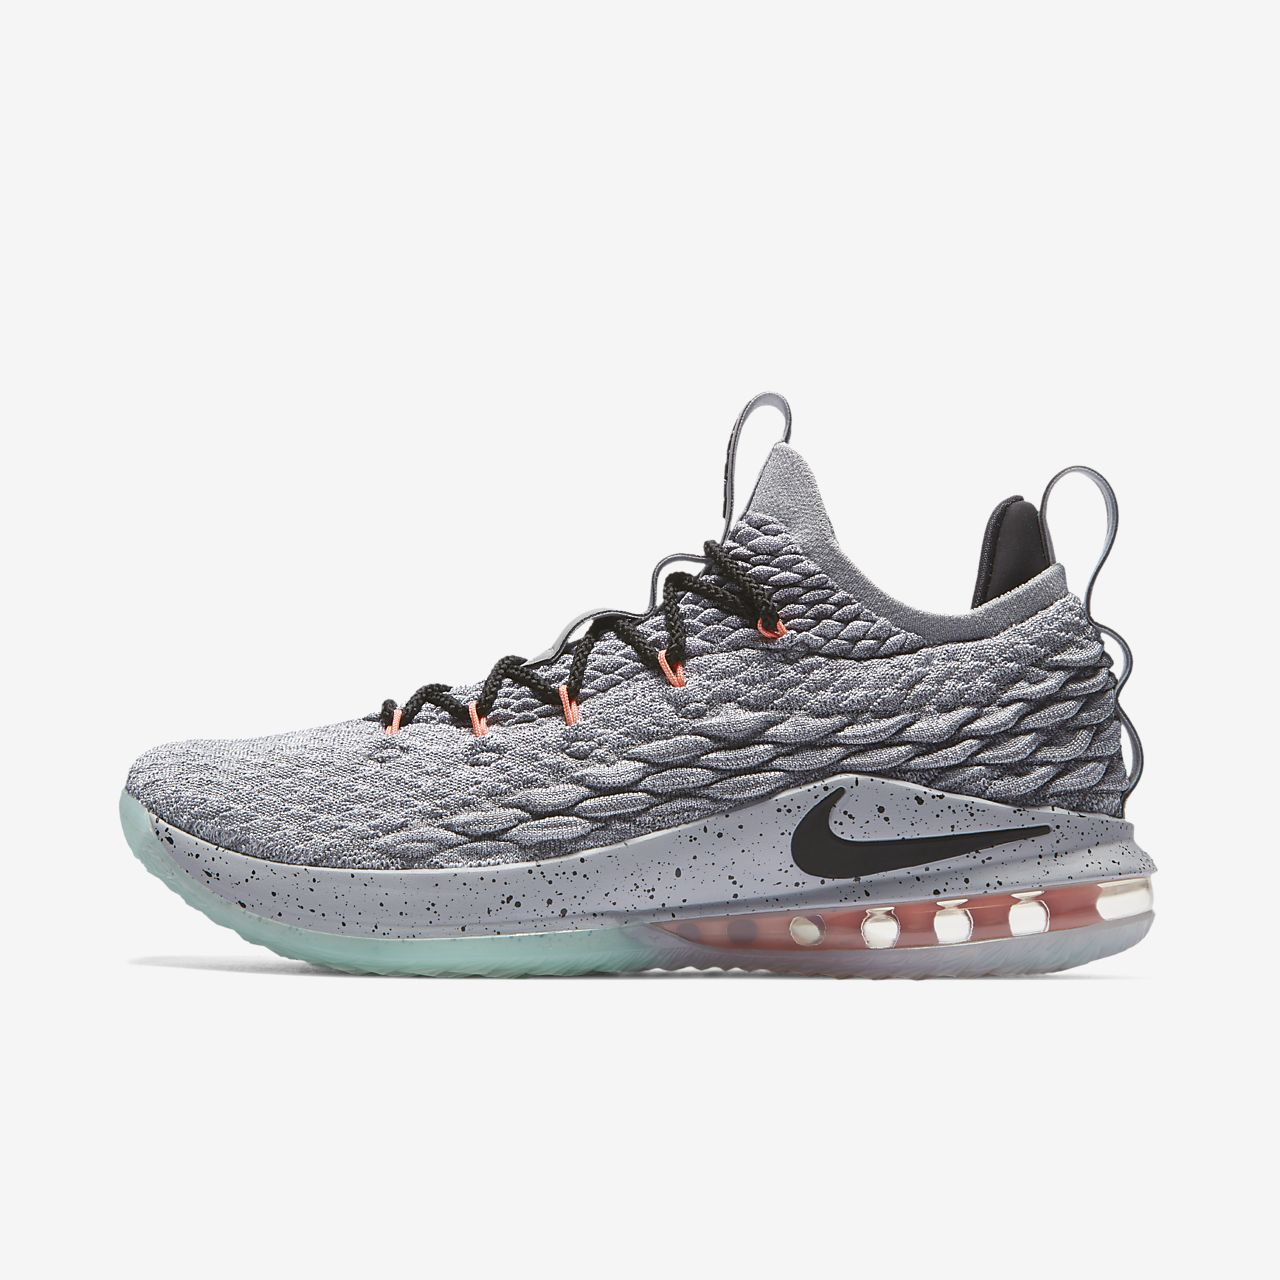 LeBron 15 Low Basketball Shoe